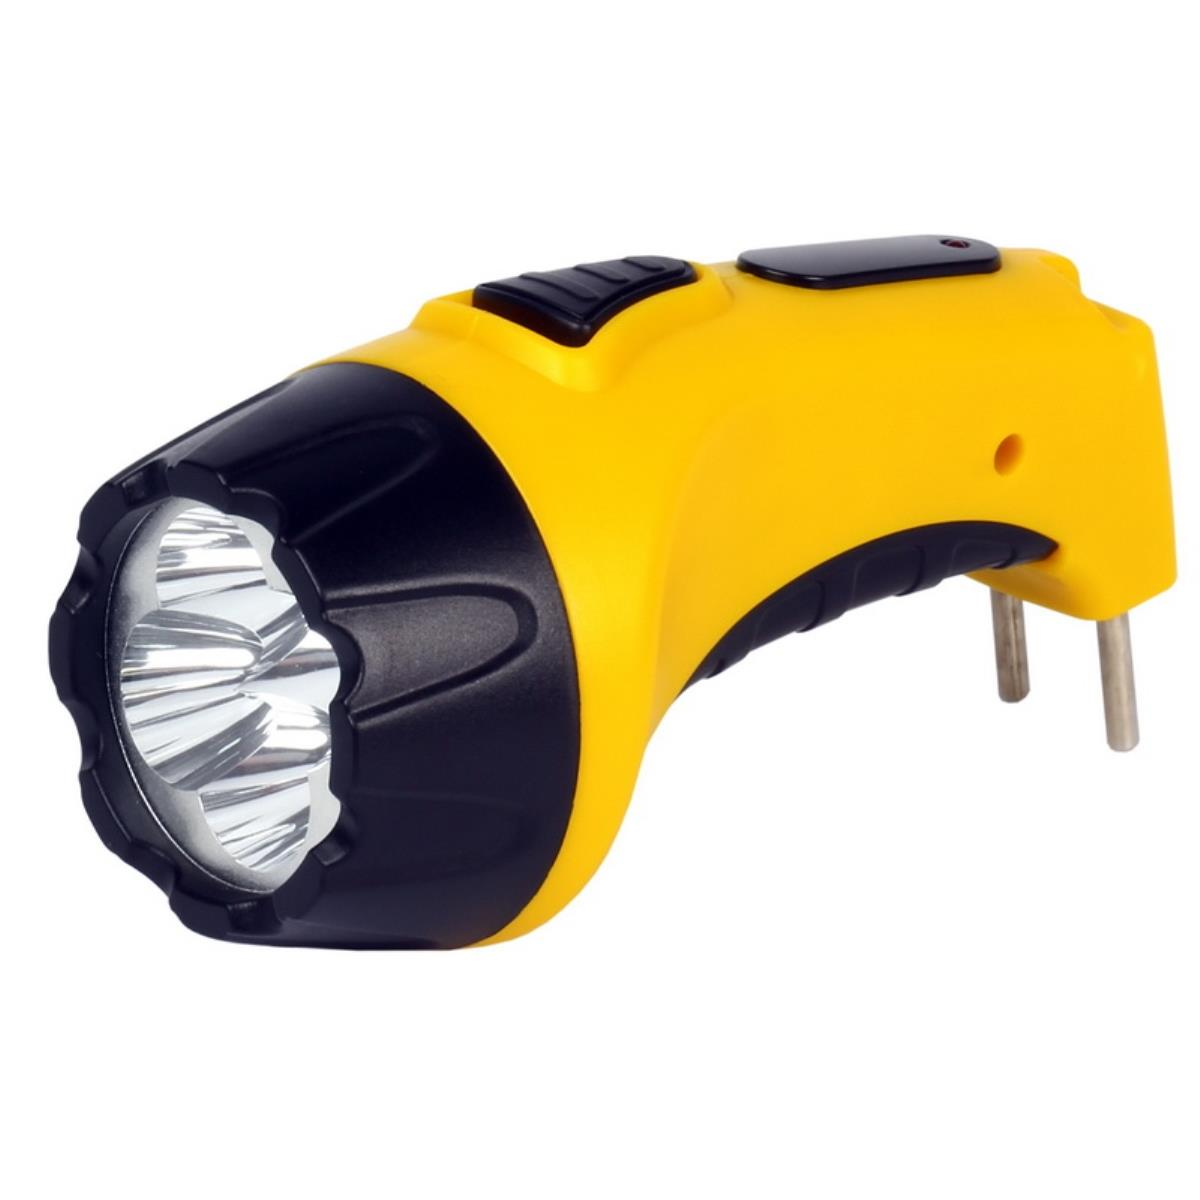 Flashlight Manual Rechargeable LED SmartBuy 500 MAh (charging From 220 V, Built-in Plug; Color: Black/same